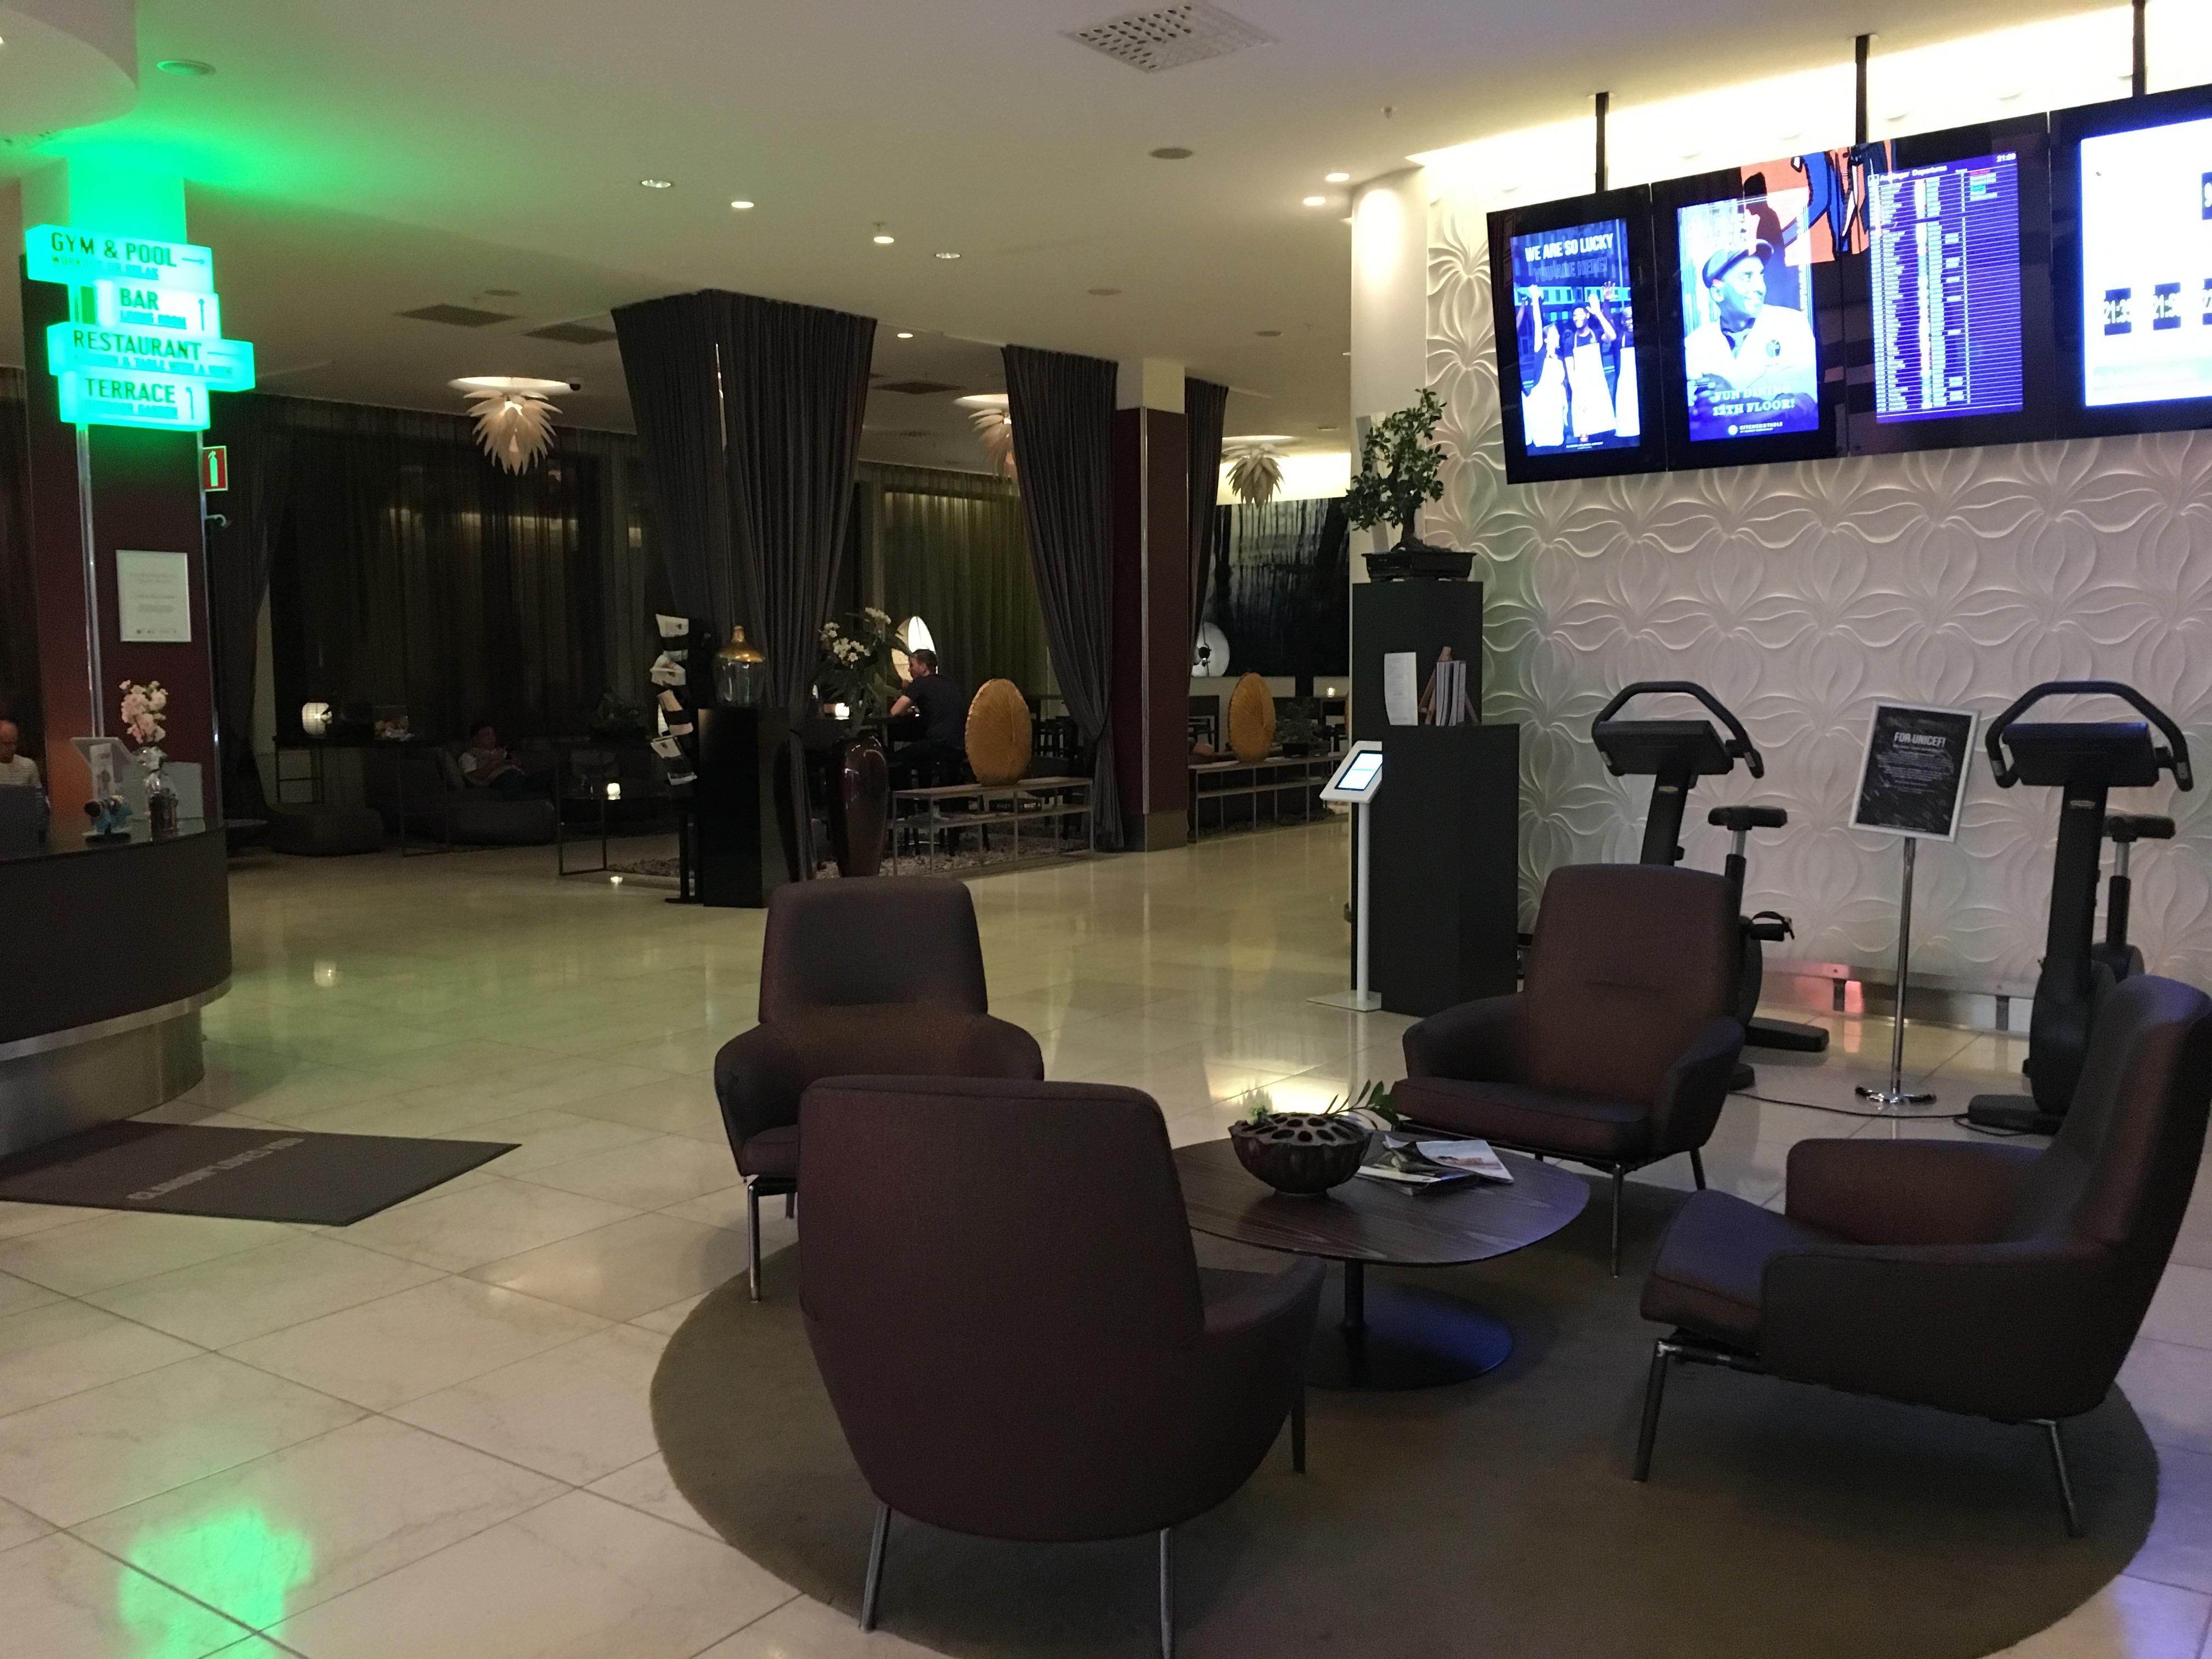 Hotel Review : クラリオンホテル アーランダエアポート(Clarion Hotel Arlanda Airport)